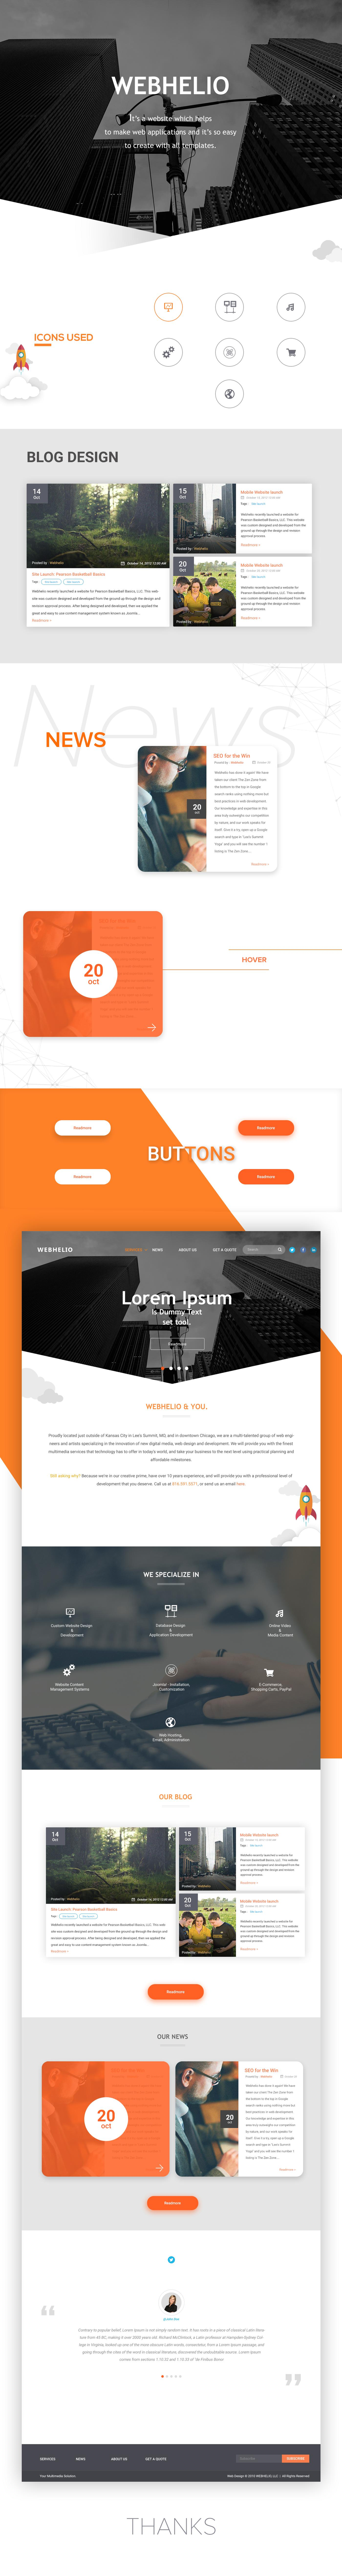 flat flatdesign icons Webdesign UI ux material trends Web webapplication redesign black orange Behance corporate